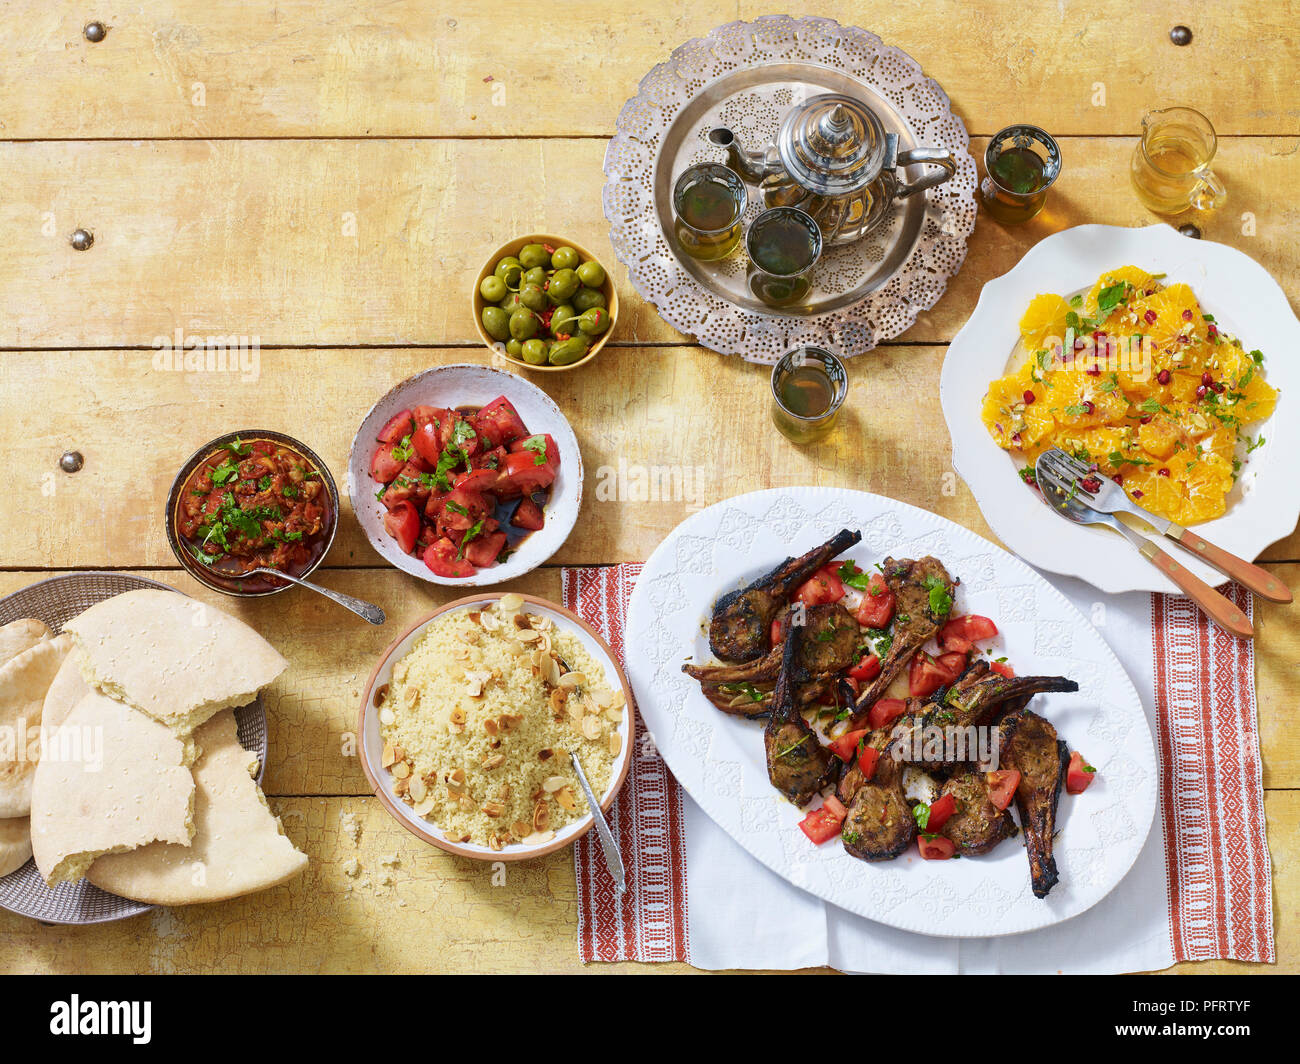 Moroccan dinner, including zahlouk (aubergine dip), kesra (bread), kesksou (couscous), lahma meshwi (lamb), olives, mint tea, salade d'oranges a la marocaine - Stock Image